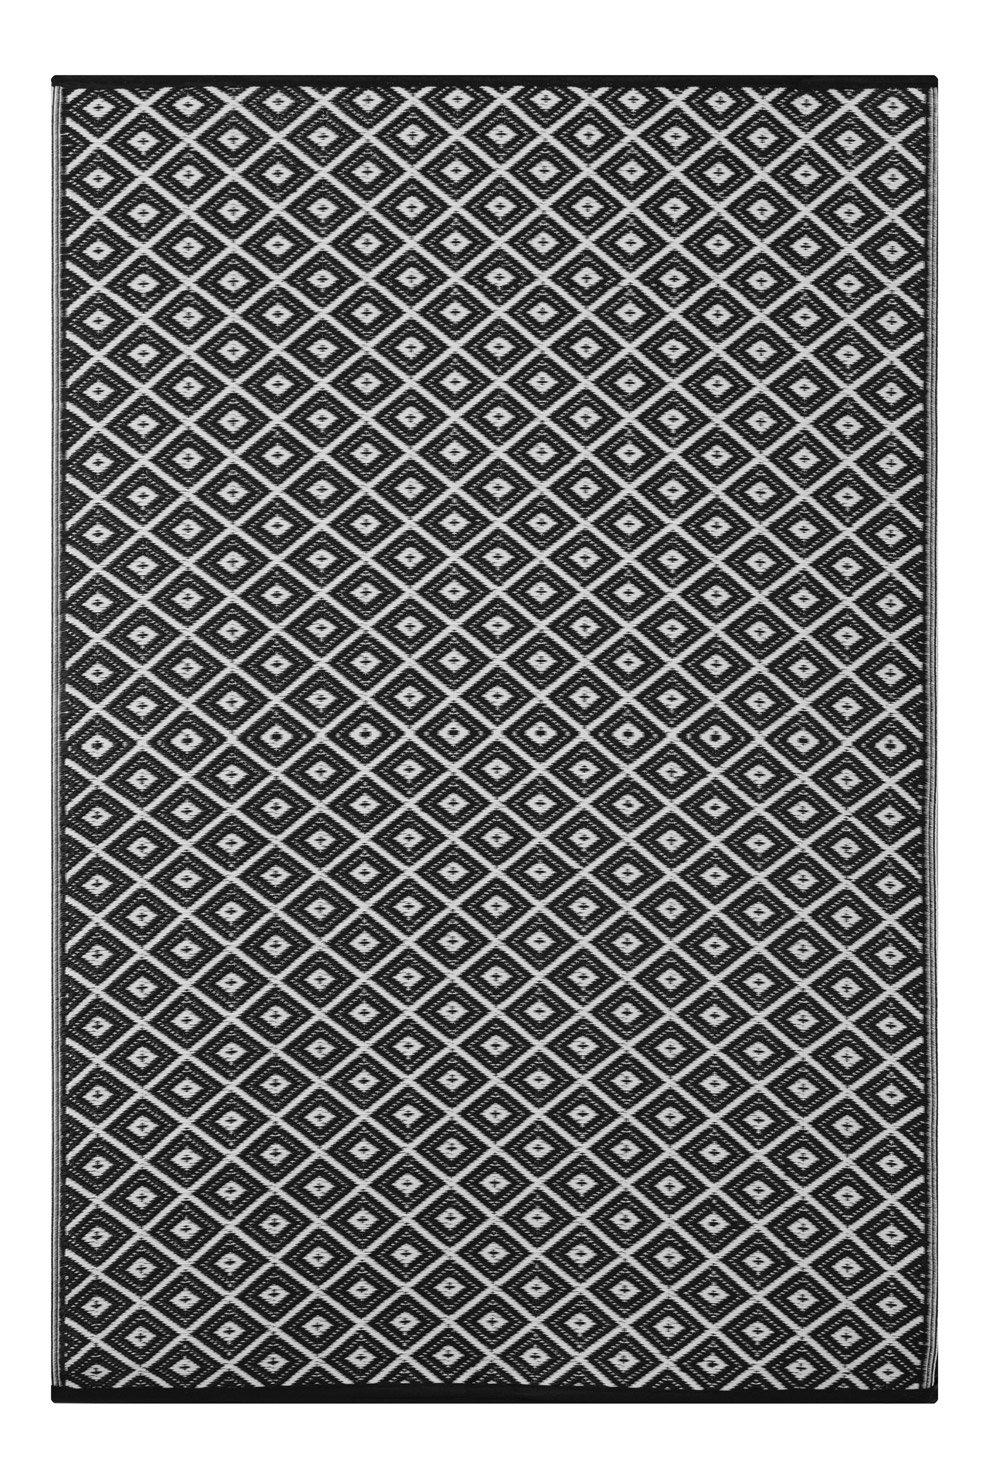 Lightweight Outdoor Reversible Plastic Rug Arabian nights Black / White - 150 cm x 240 cm (5ft x 8ft)